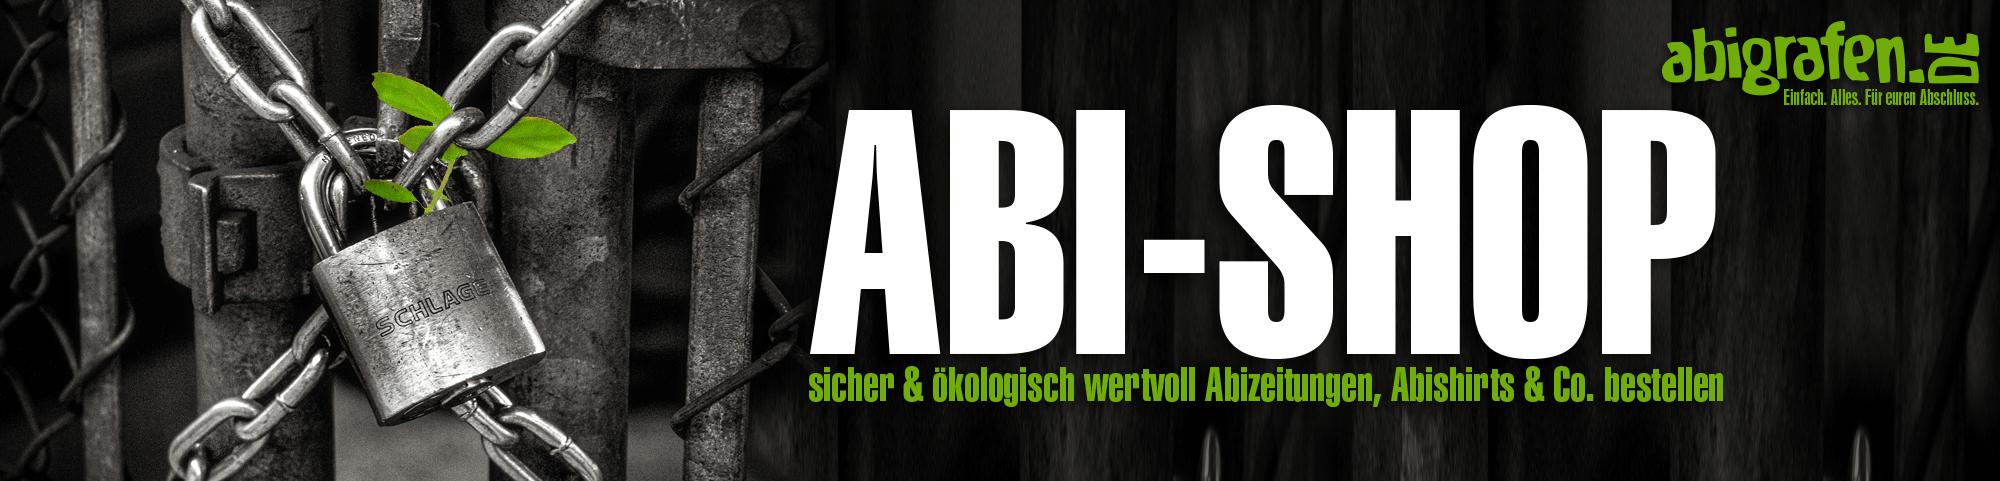 Qualitätsstandards abigrafen.de Abi-Shop